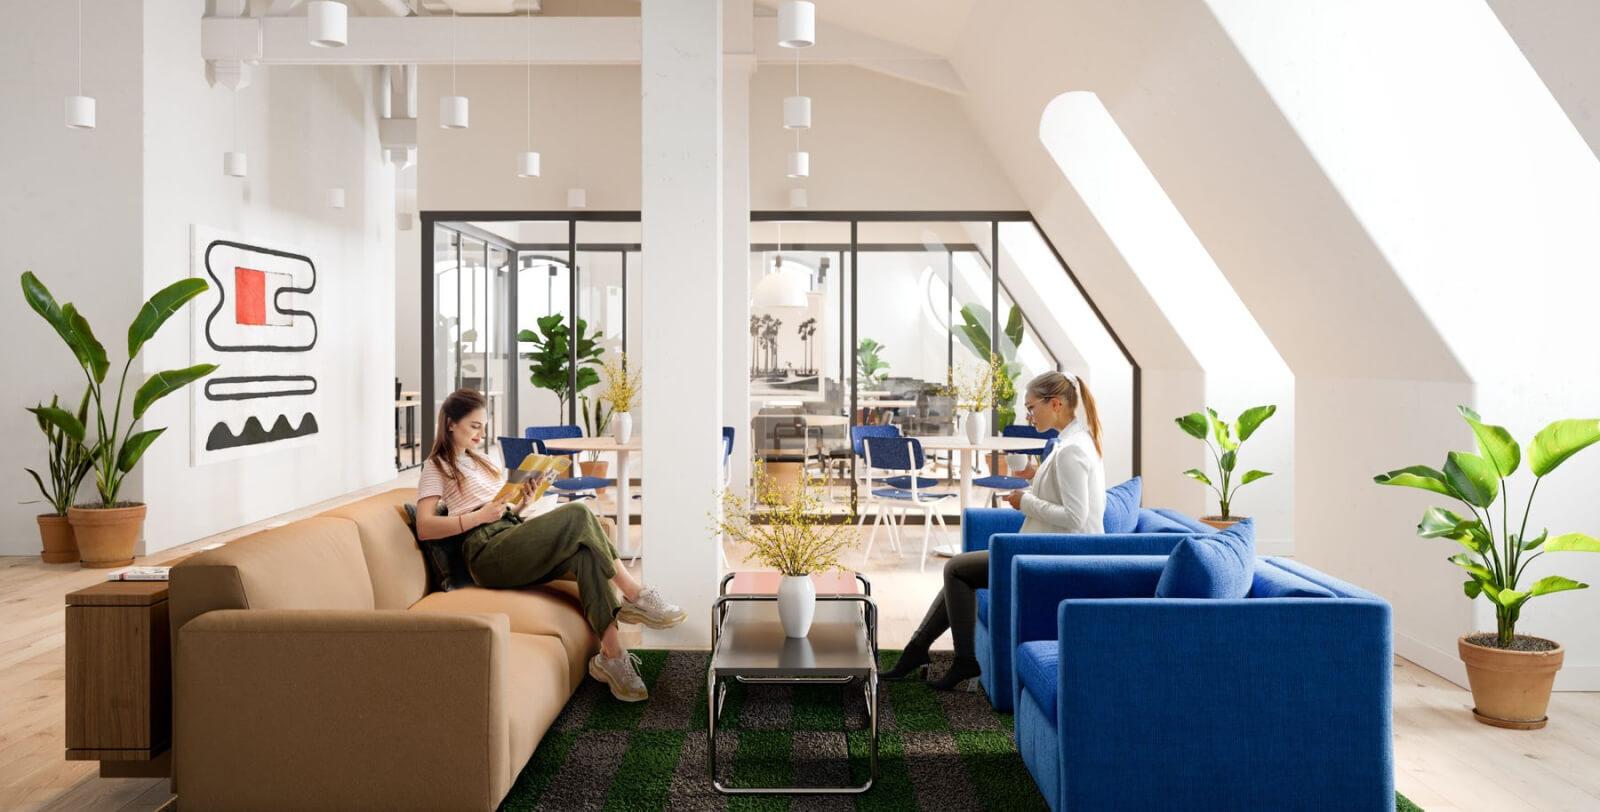 Mindsay Paris Office